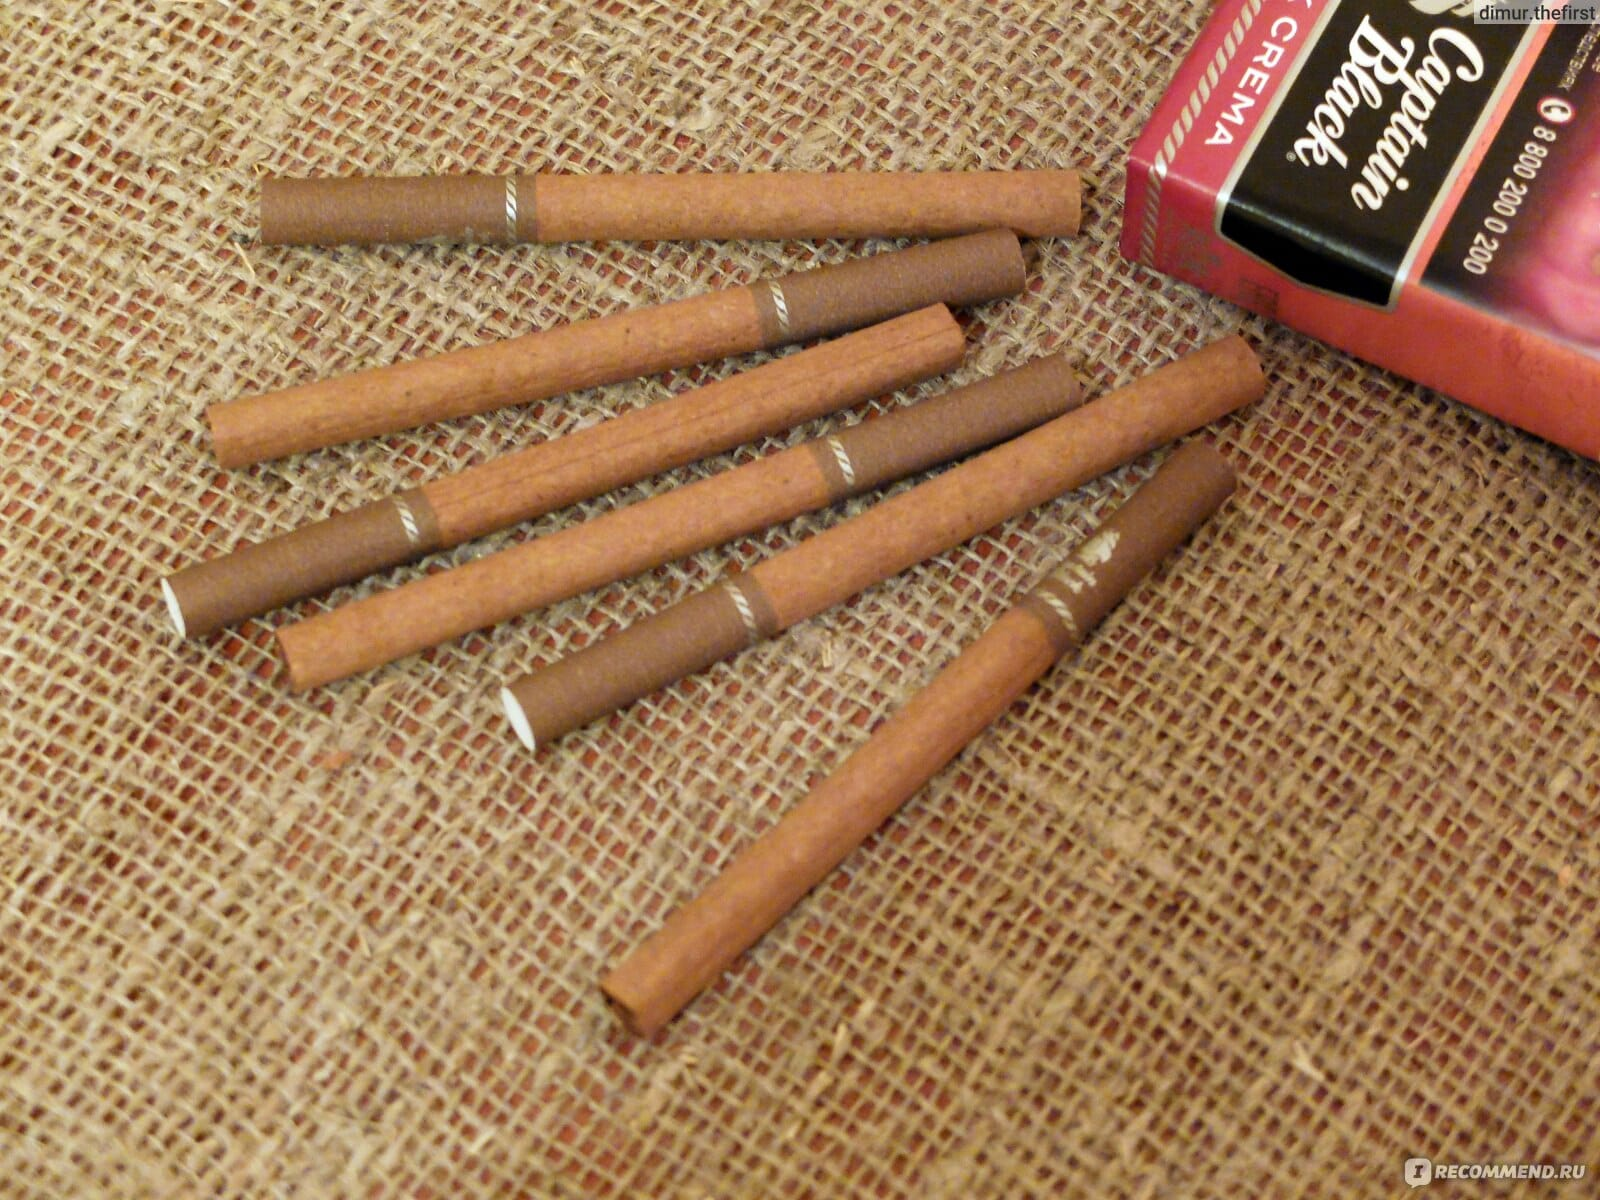 Сигареты Капитан Блэк